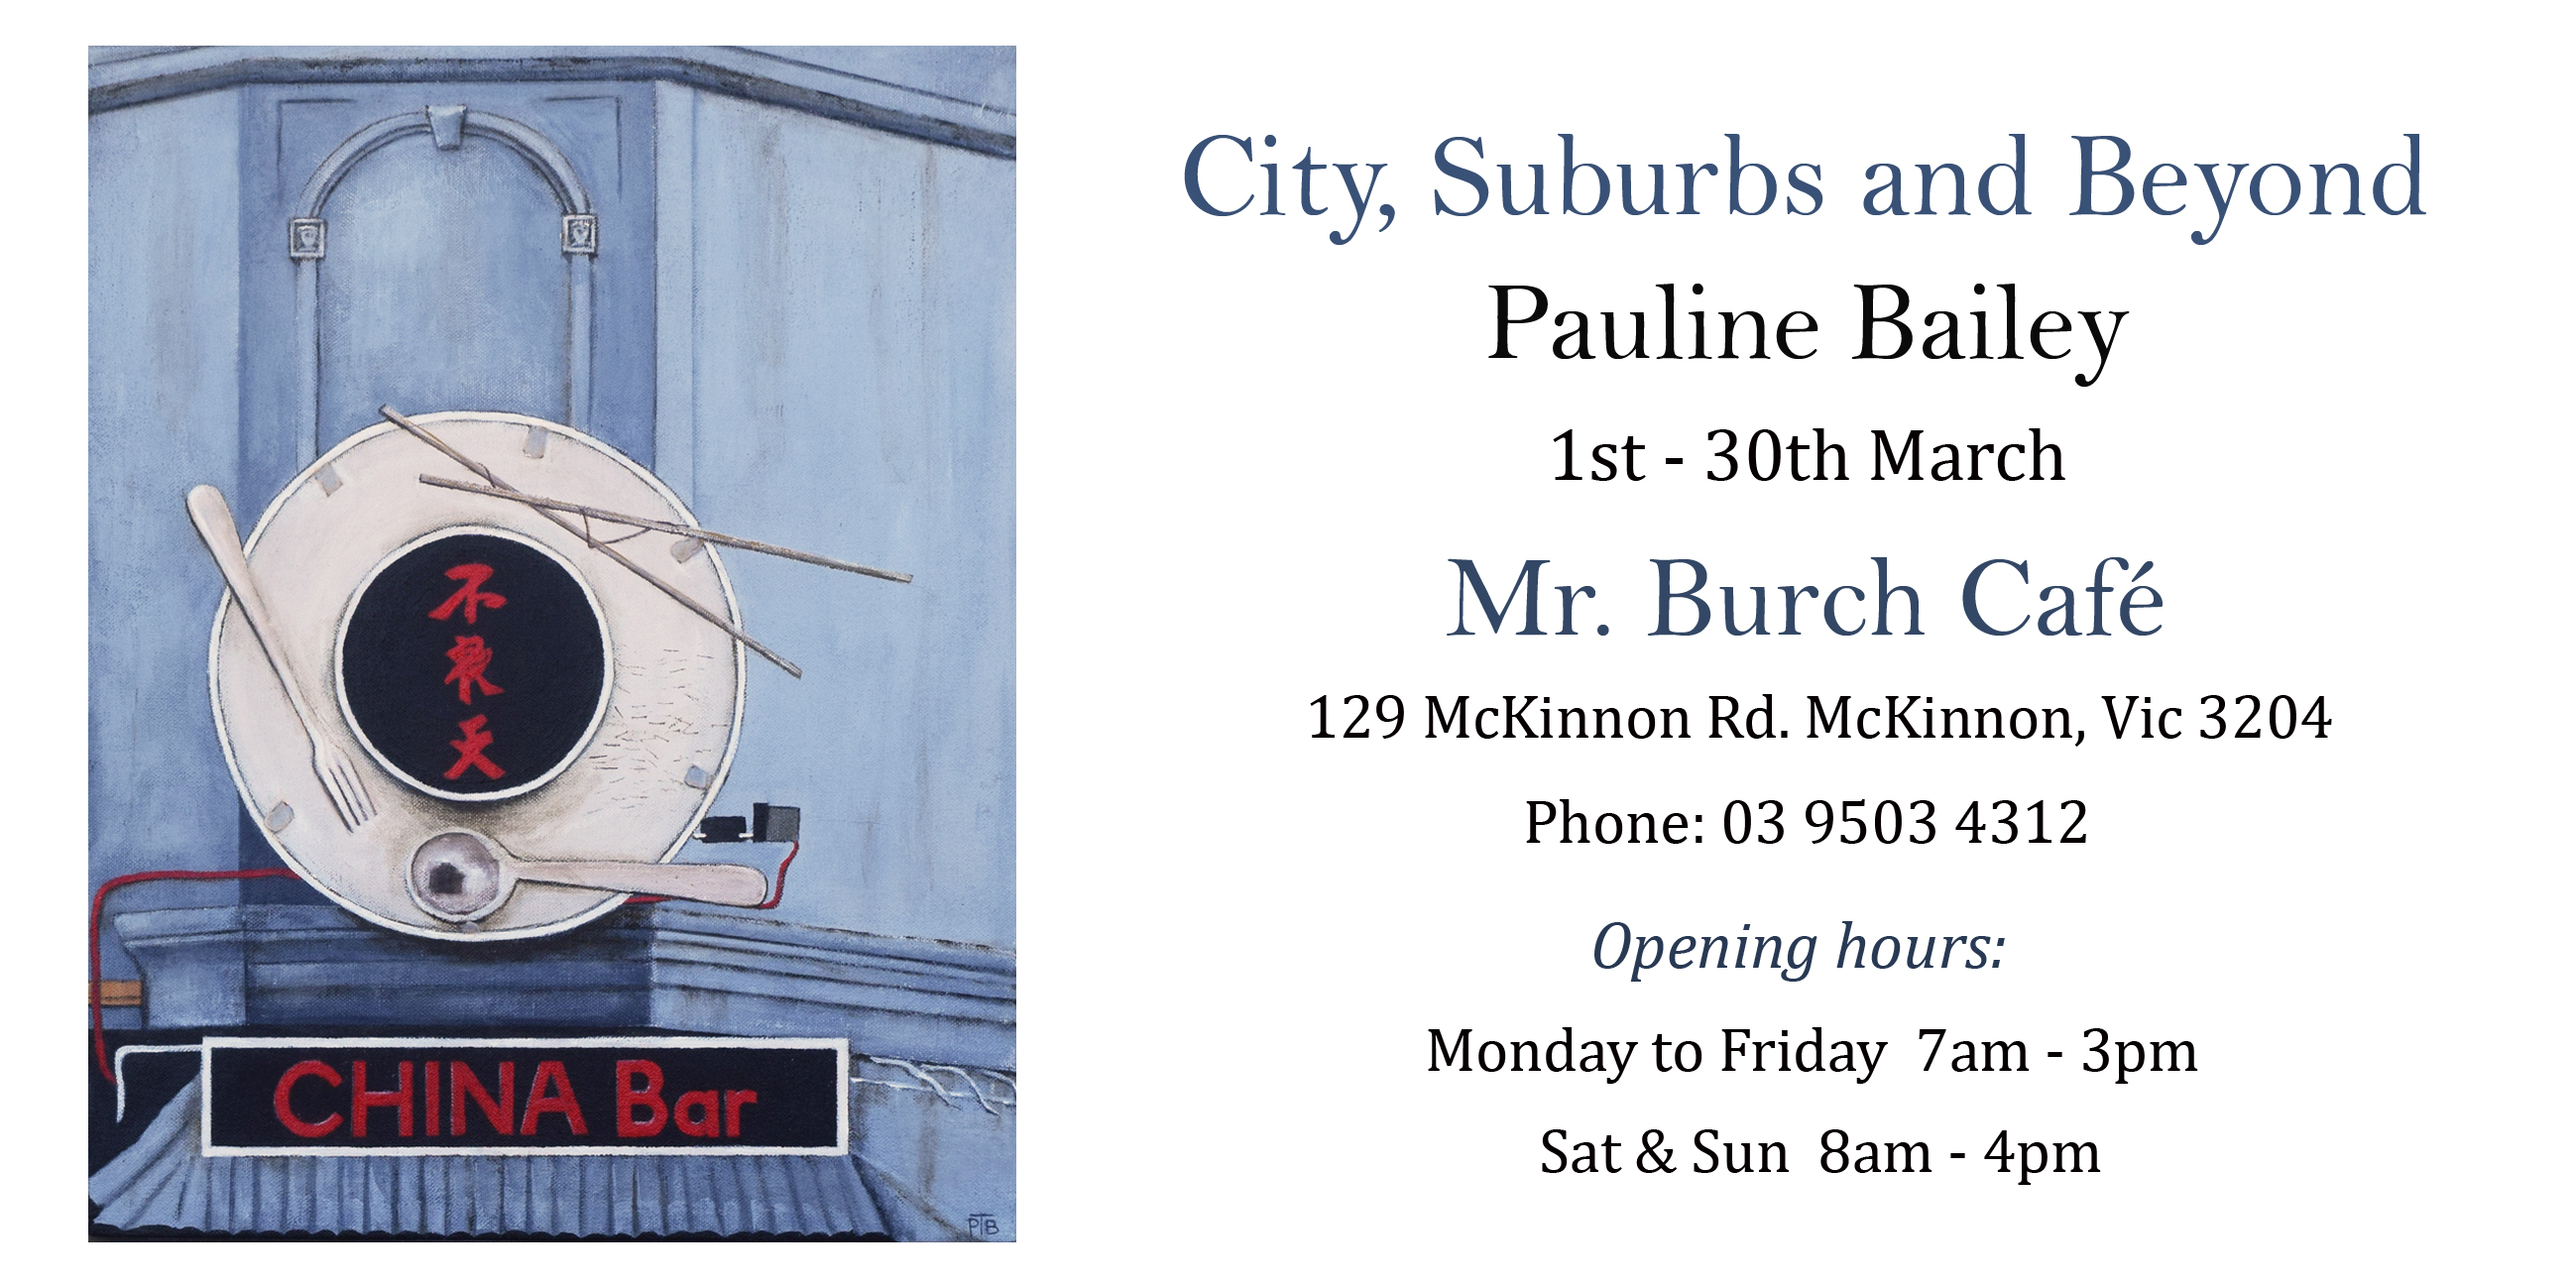 City, Suburbs and Beyond_Pauline Bailey